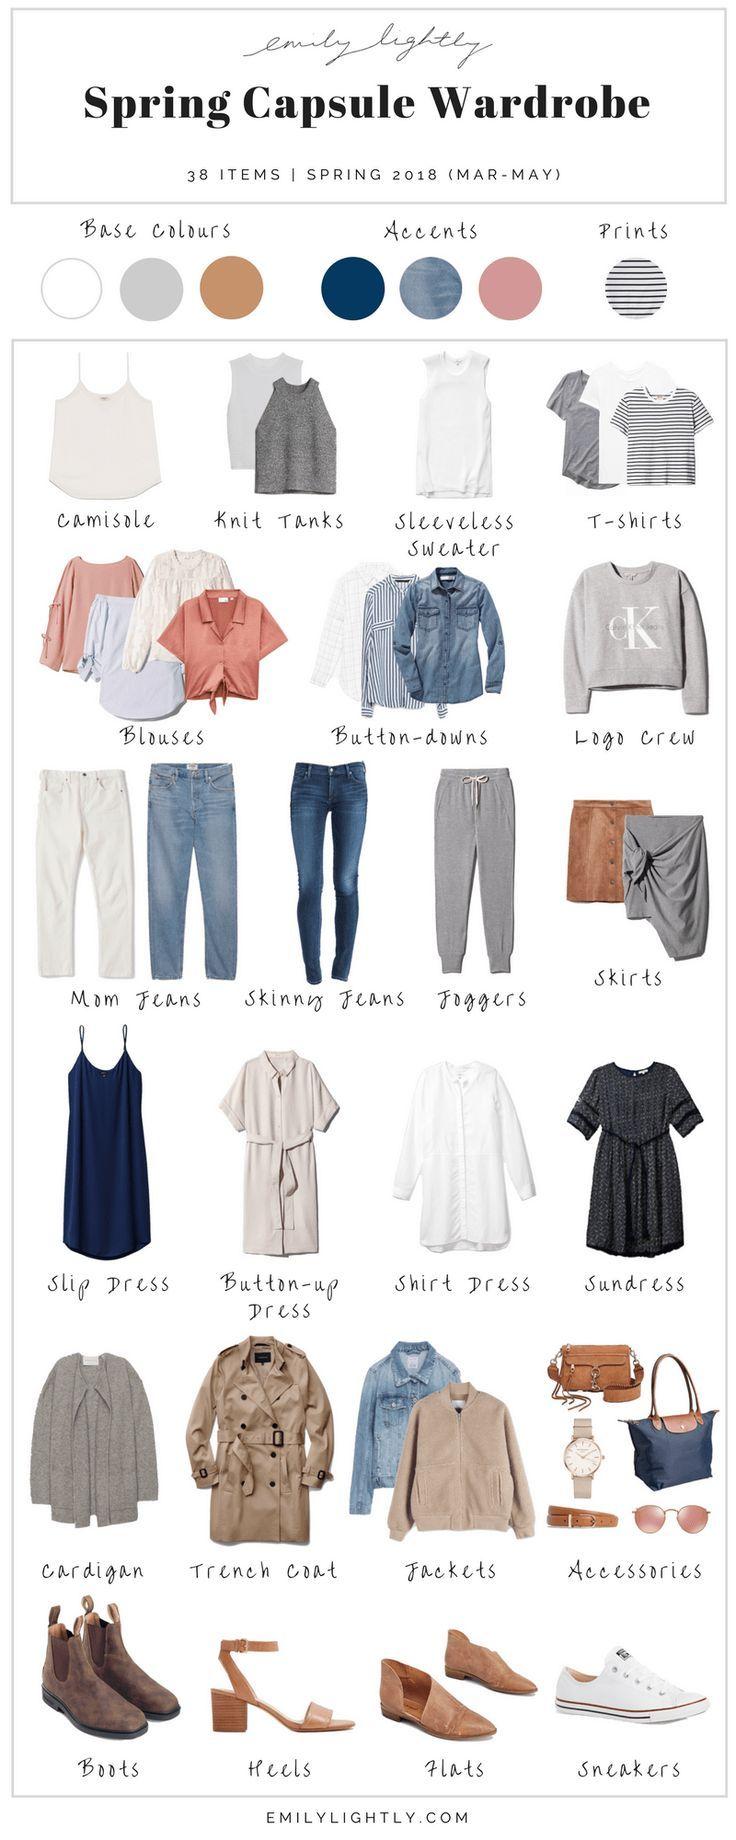 My Spring 2018 Capsule Wardrobe (Emily Lightly)